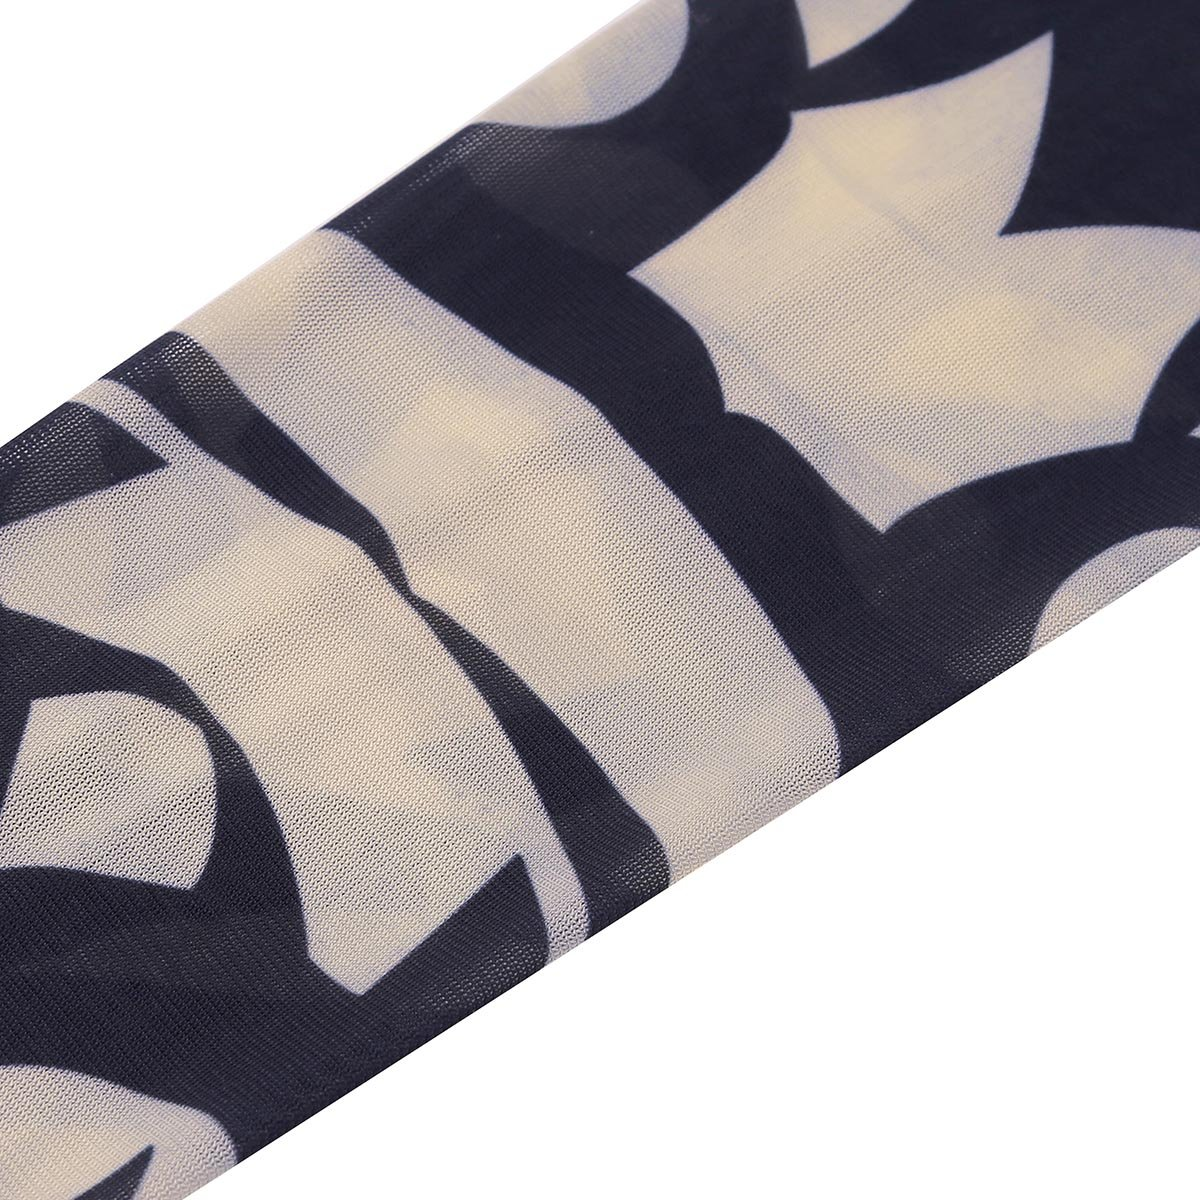 Homme Tiaobug Unisexe 1paire Manchettes Tattoo Bras Manches Respirant Tatouage Manchons A Bra Protection Anti Soleil Uv Compression Manchettes Pour Sport Tennis Football Cyclisme Sports Et Loisirs Hotelaomori Co Jp